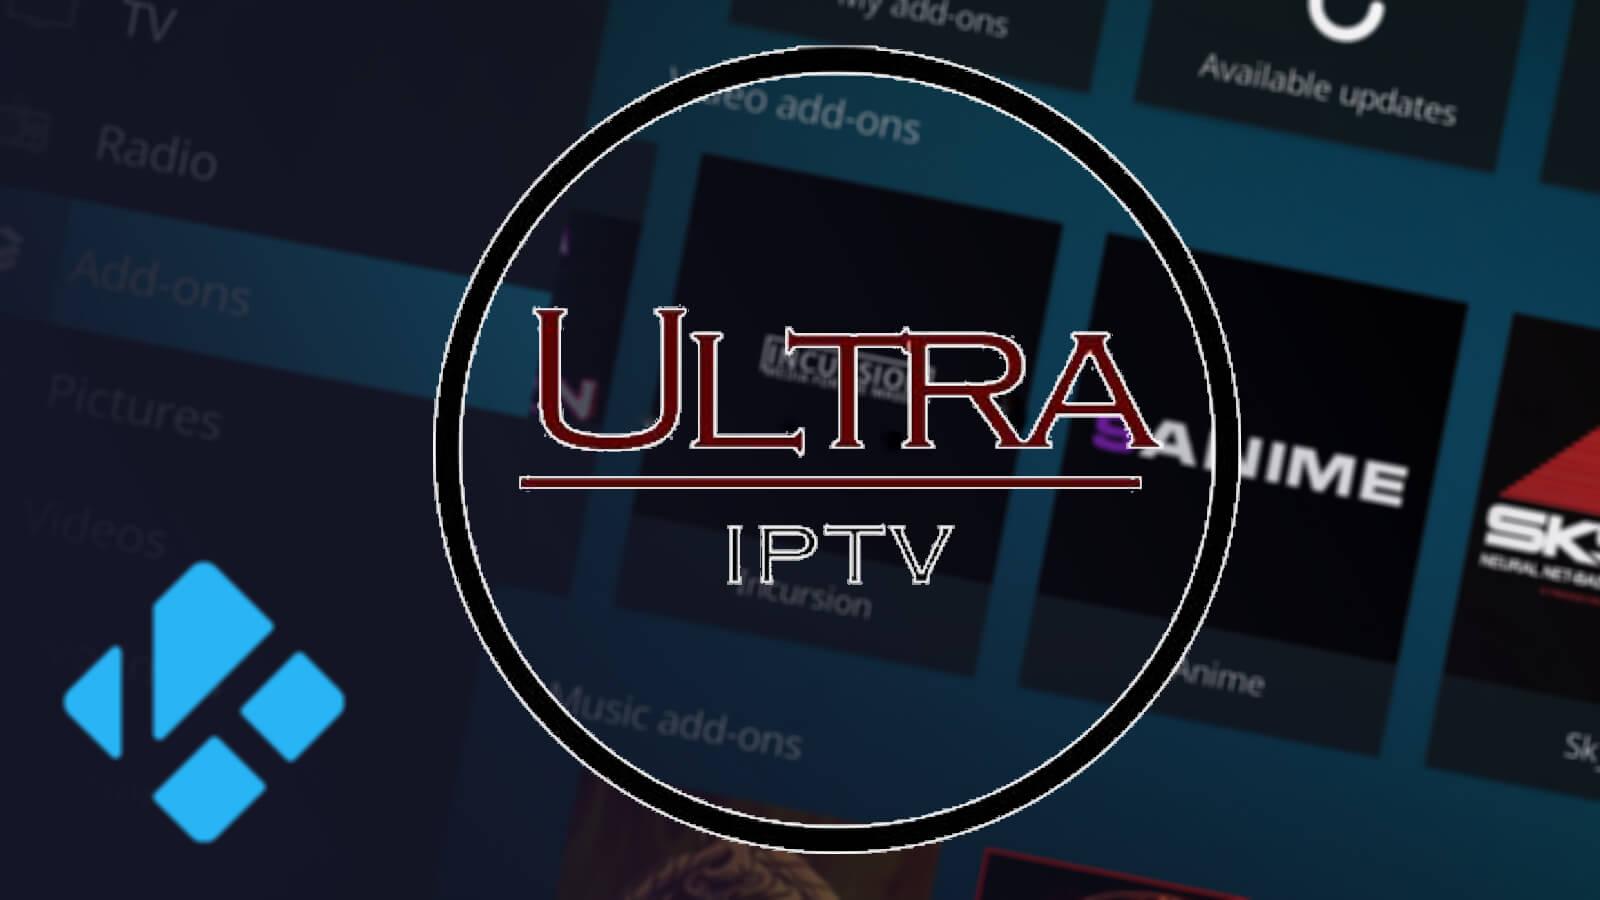 Ultra IPTV Kodi Addon: How to Install & Use on Any Device